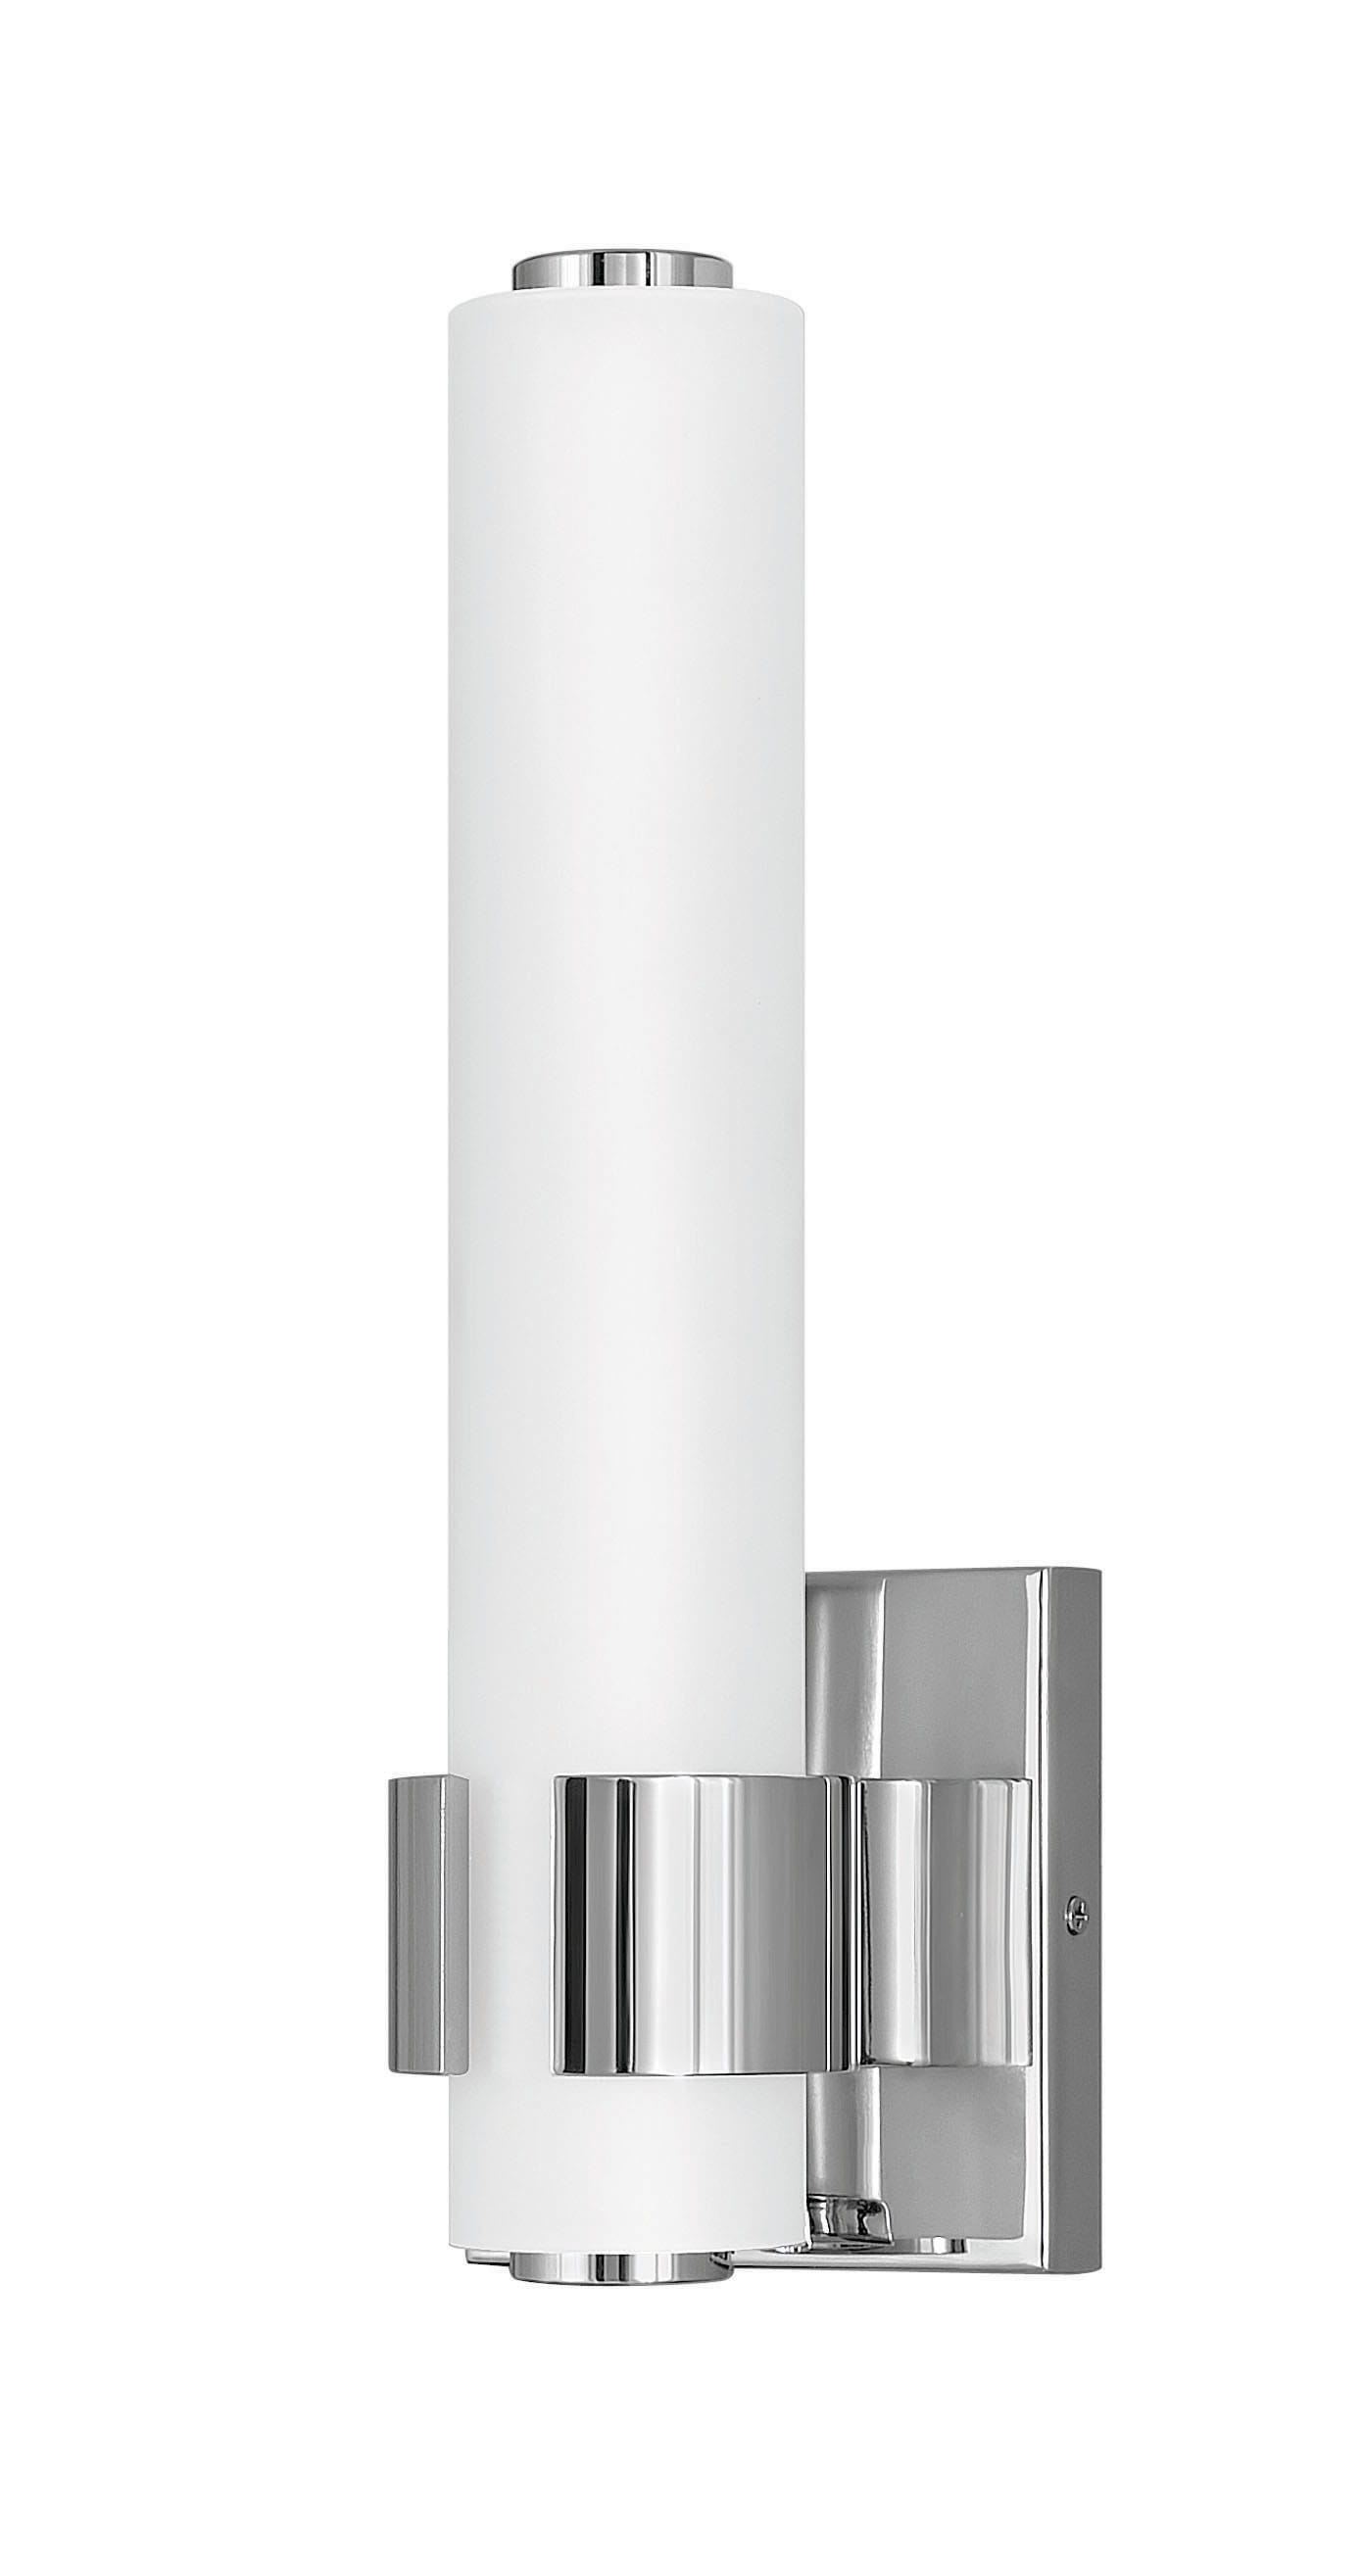 Image of: Hinkley Lighting 53060bk Black Aiden 14 Tall Integrated Led Bathroom Sconce Lightingdirect Com